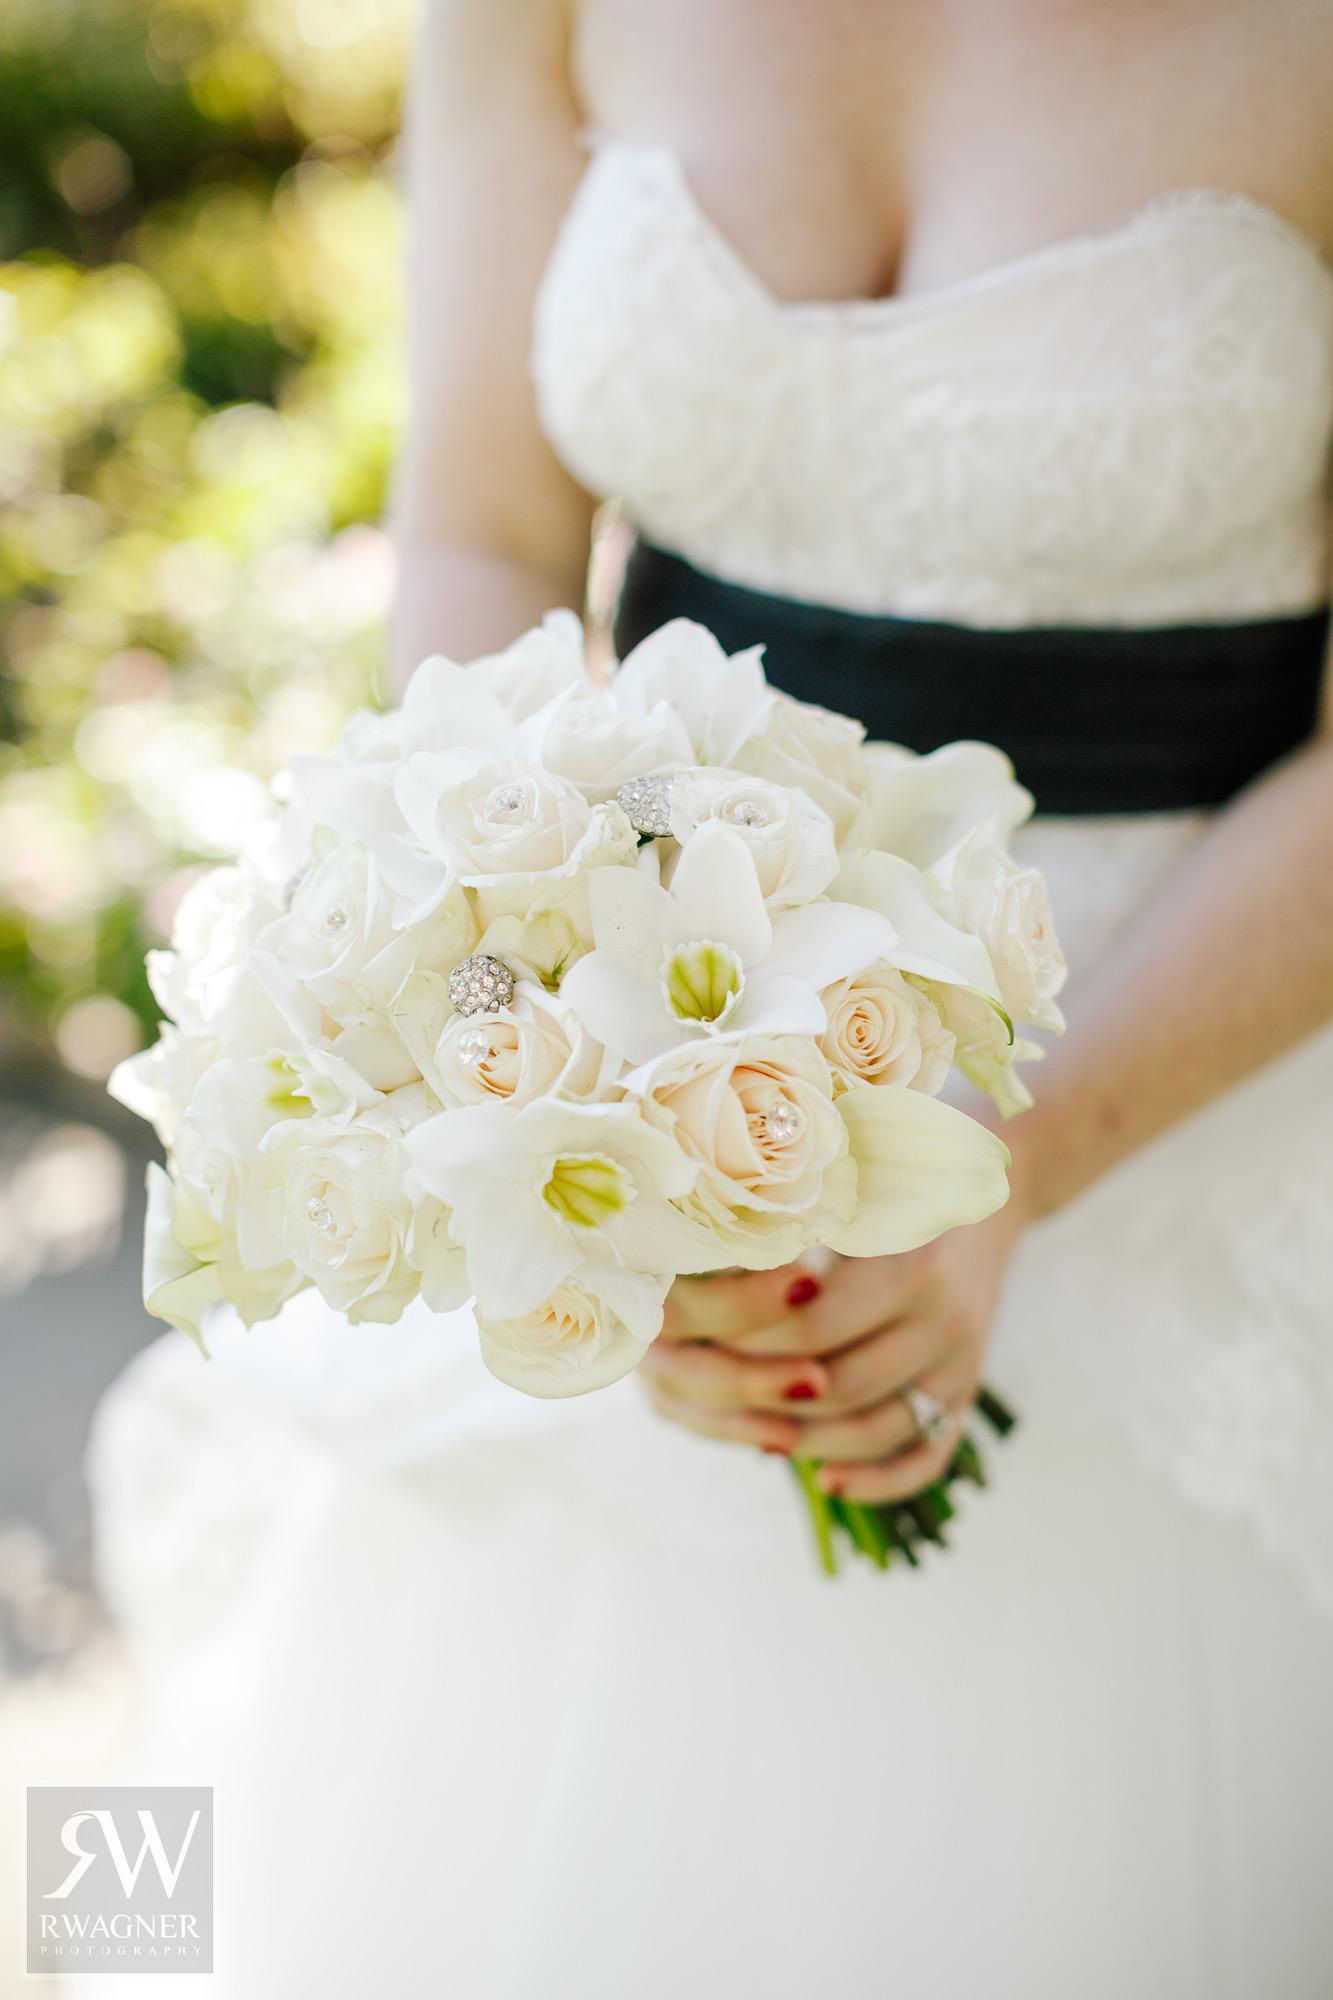 ceci_new_york_luxury_wedding_invitations_couture_red_black_white_real_wedding_dramatic_inn_at_longshore_v286_11.jpg